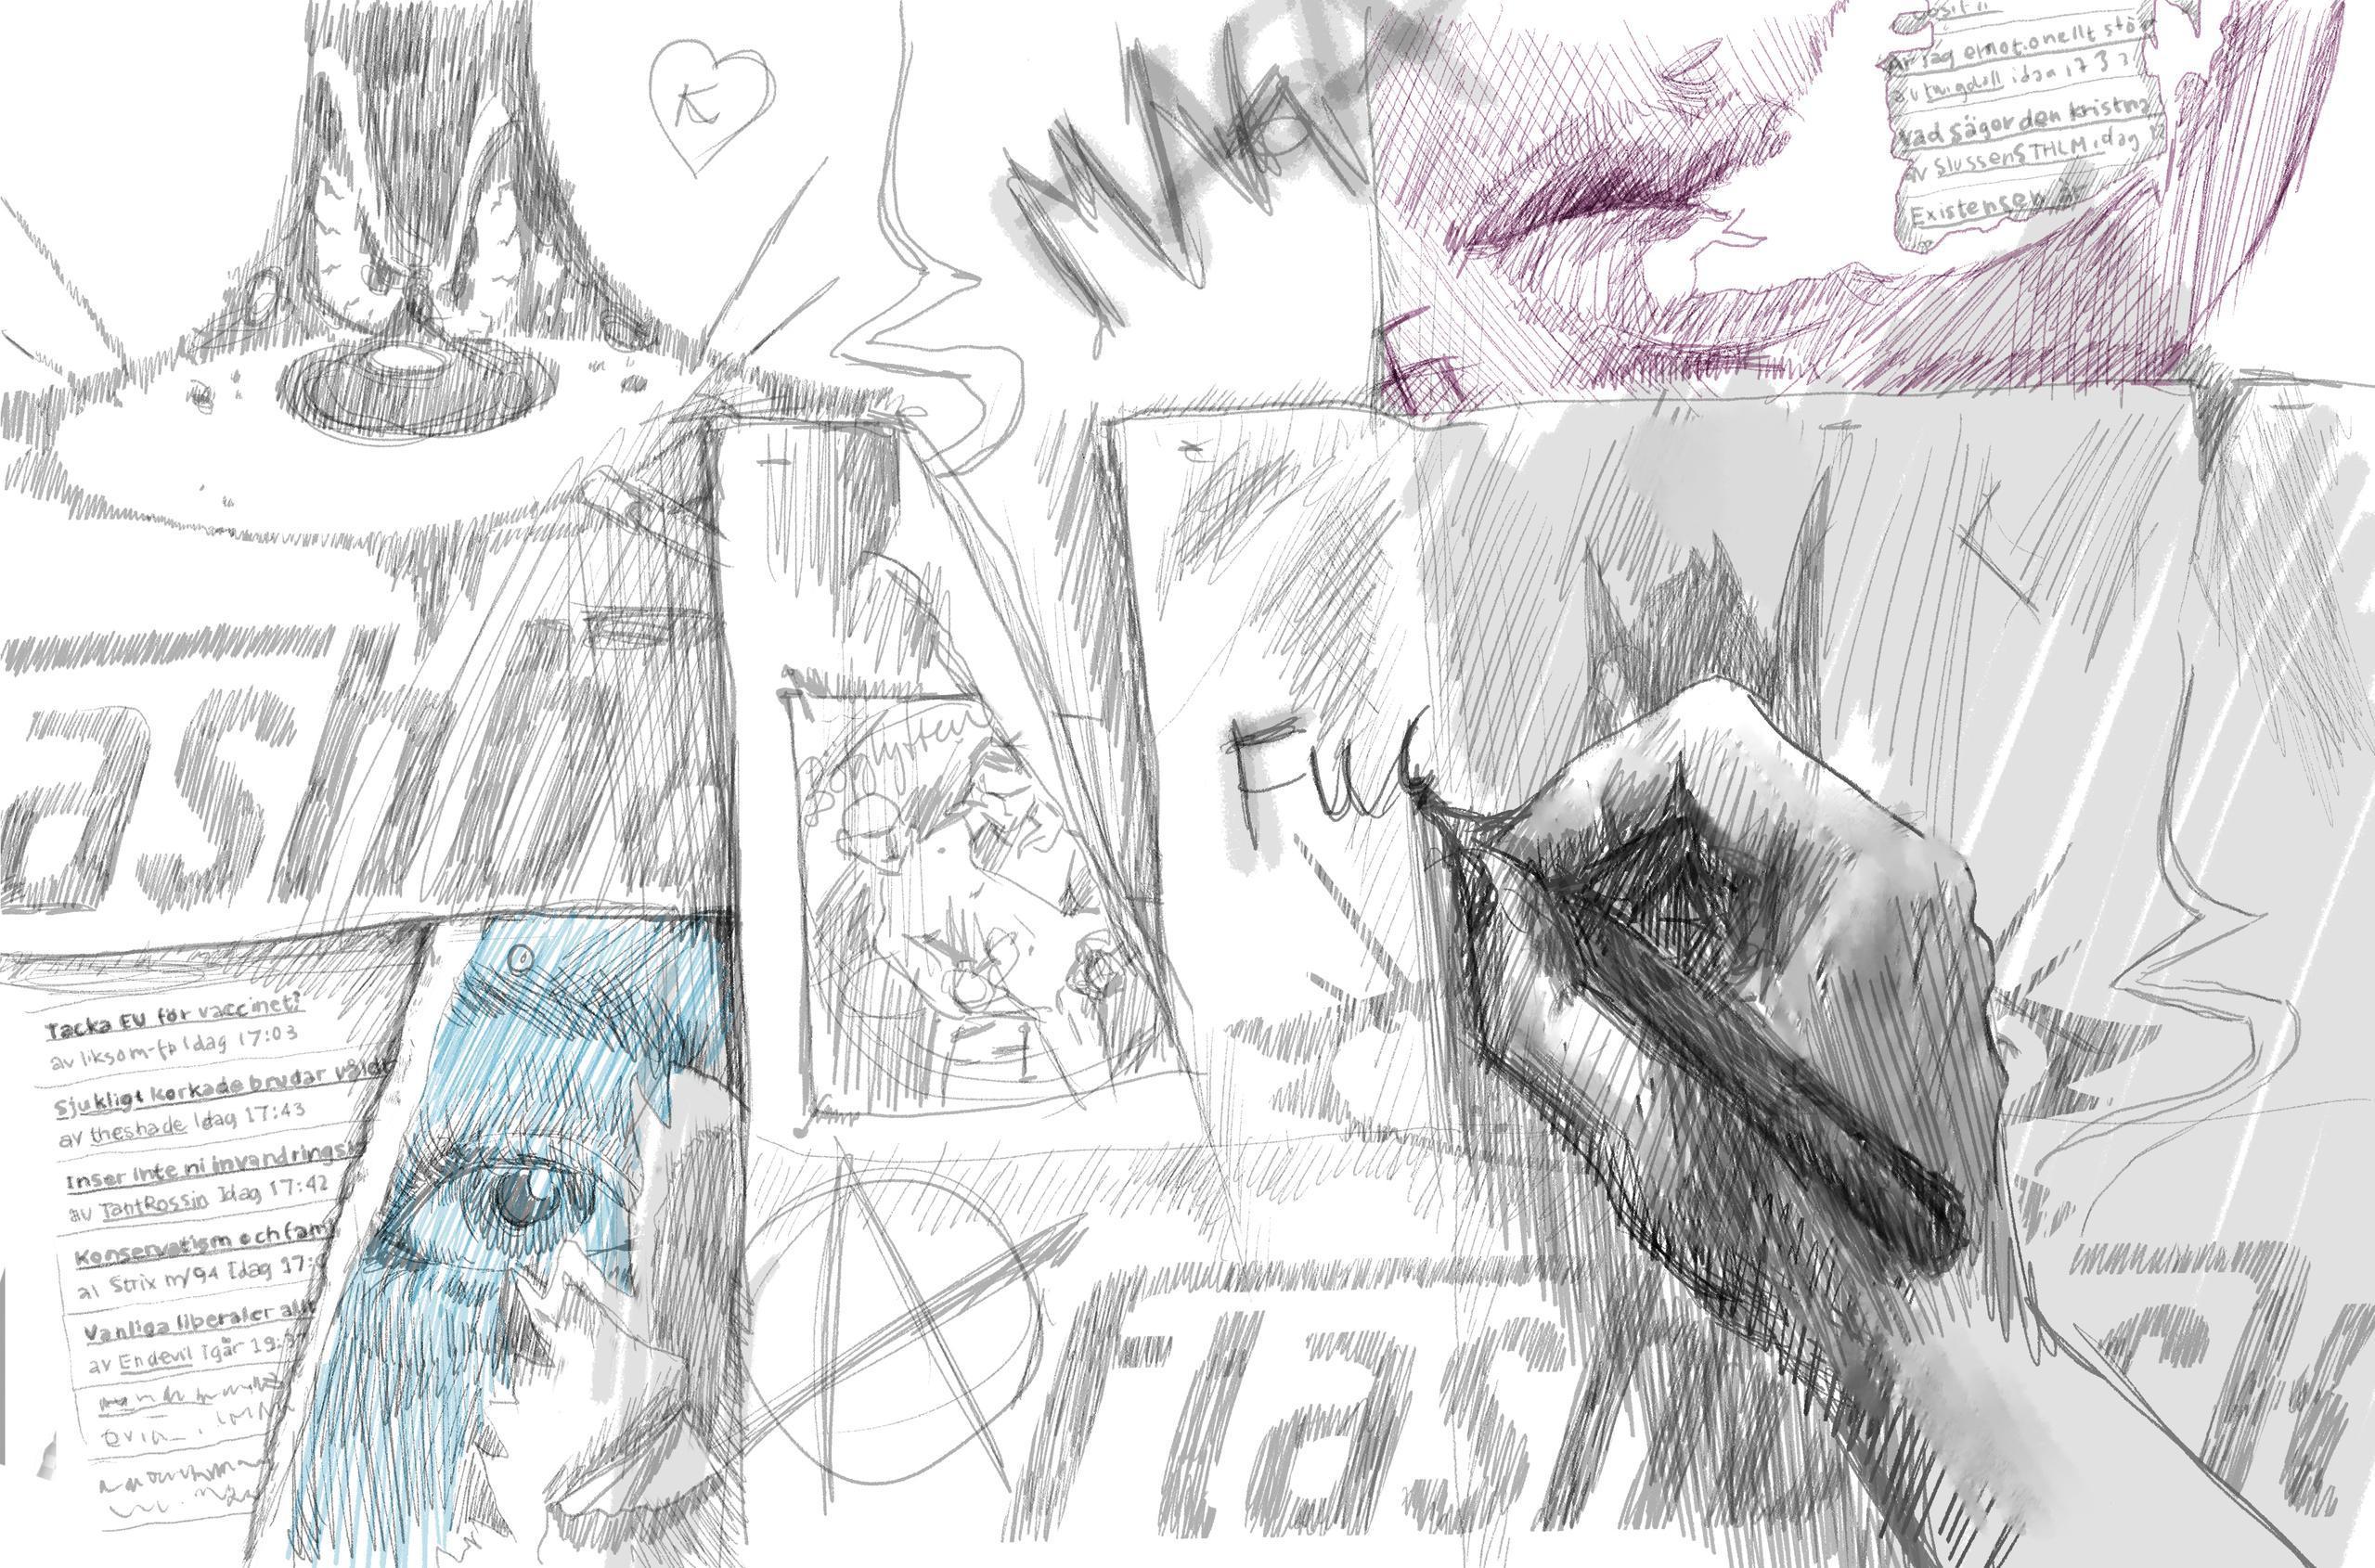 Döda Kändisar Flashback